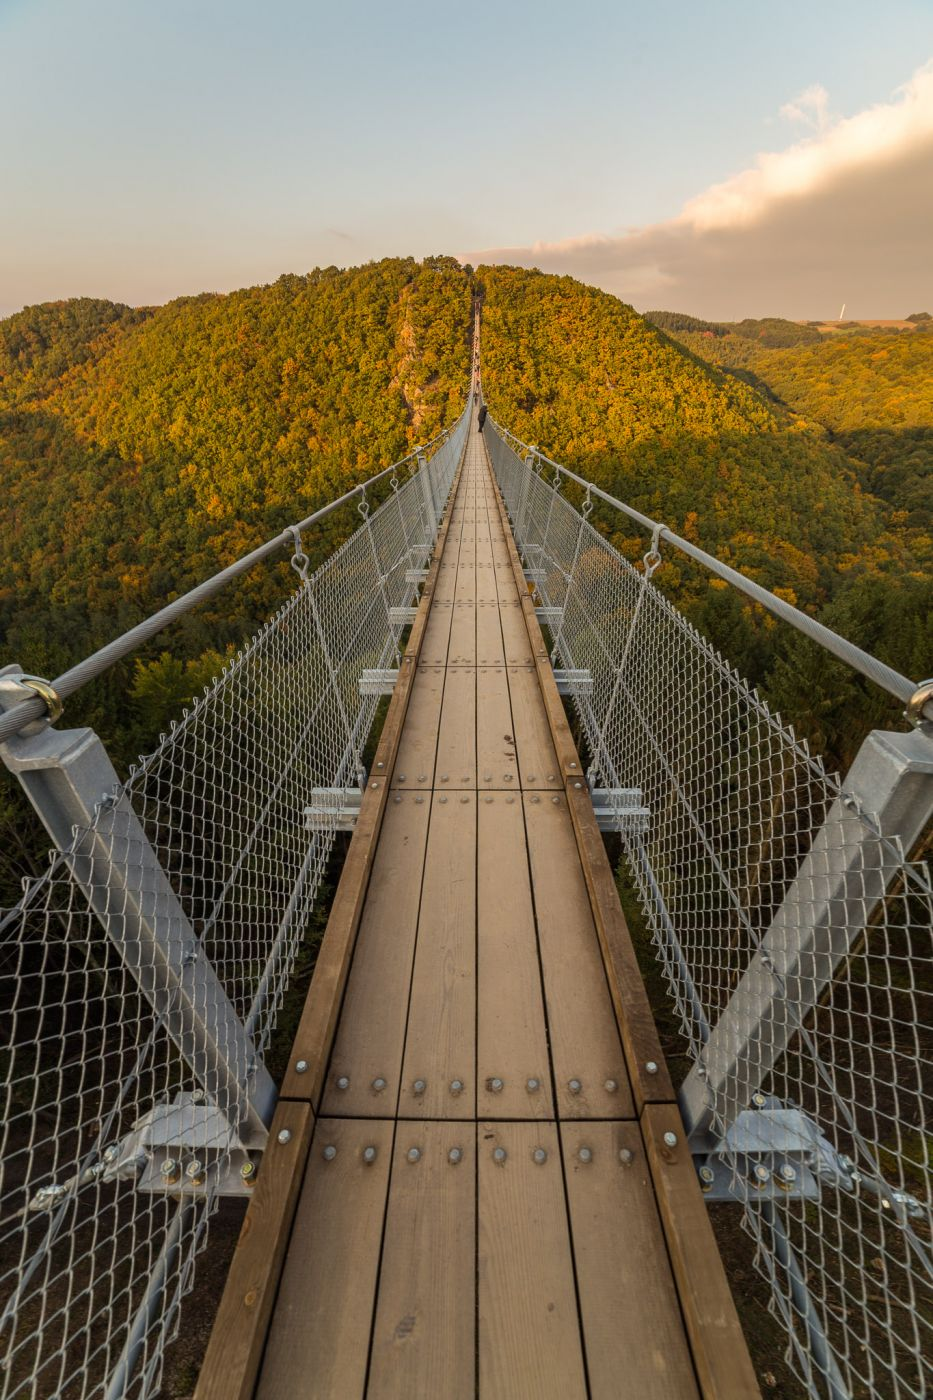 On the rope bridge, Germany